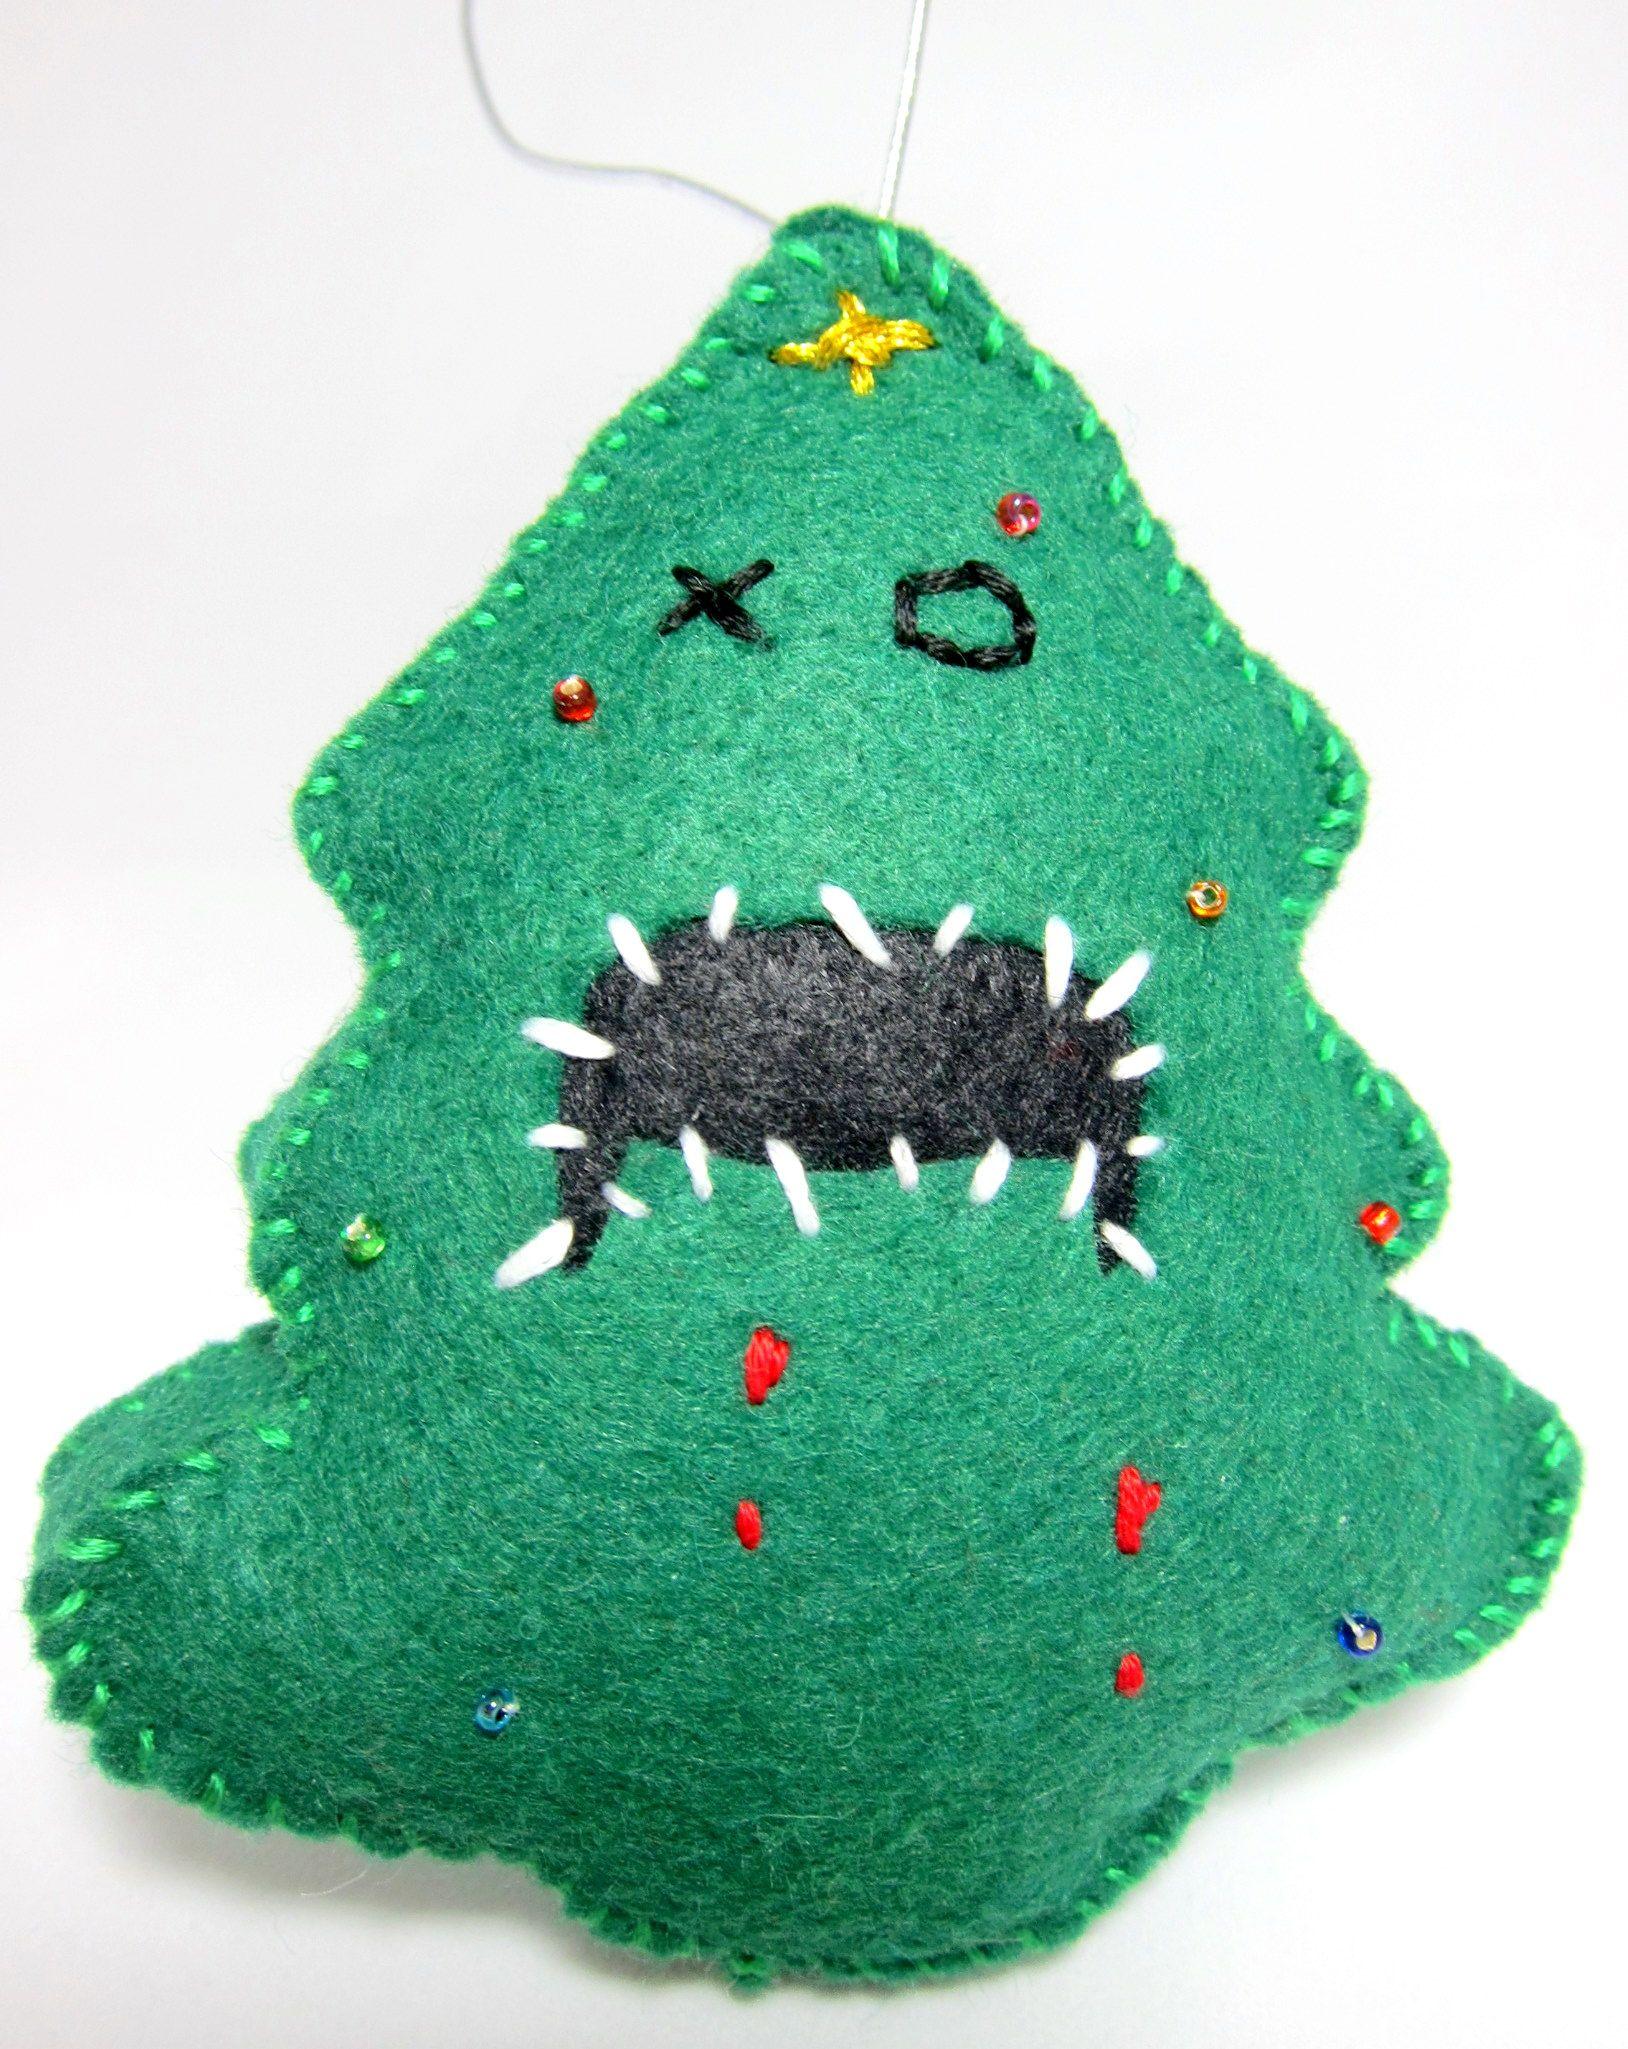 Zombie Christmas Tree Ornament | Holiday Ideas | Pinterest | Zombie ...